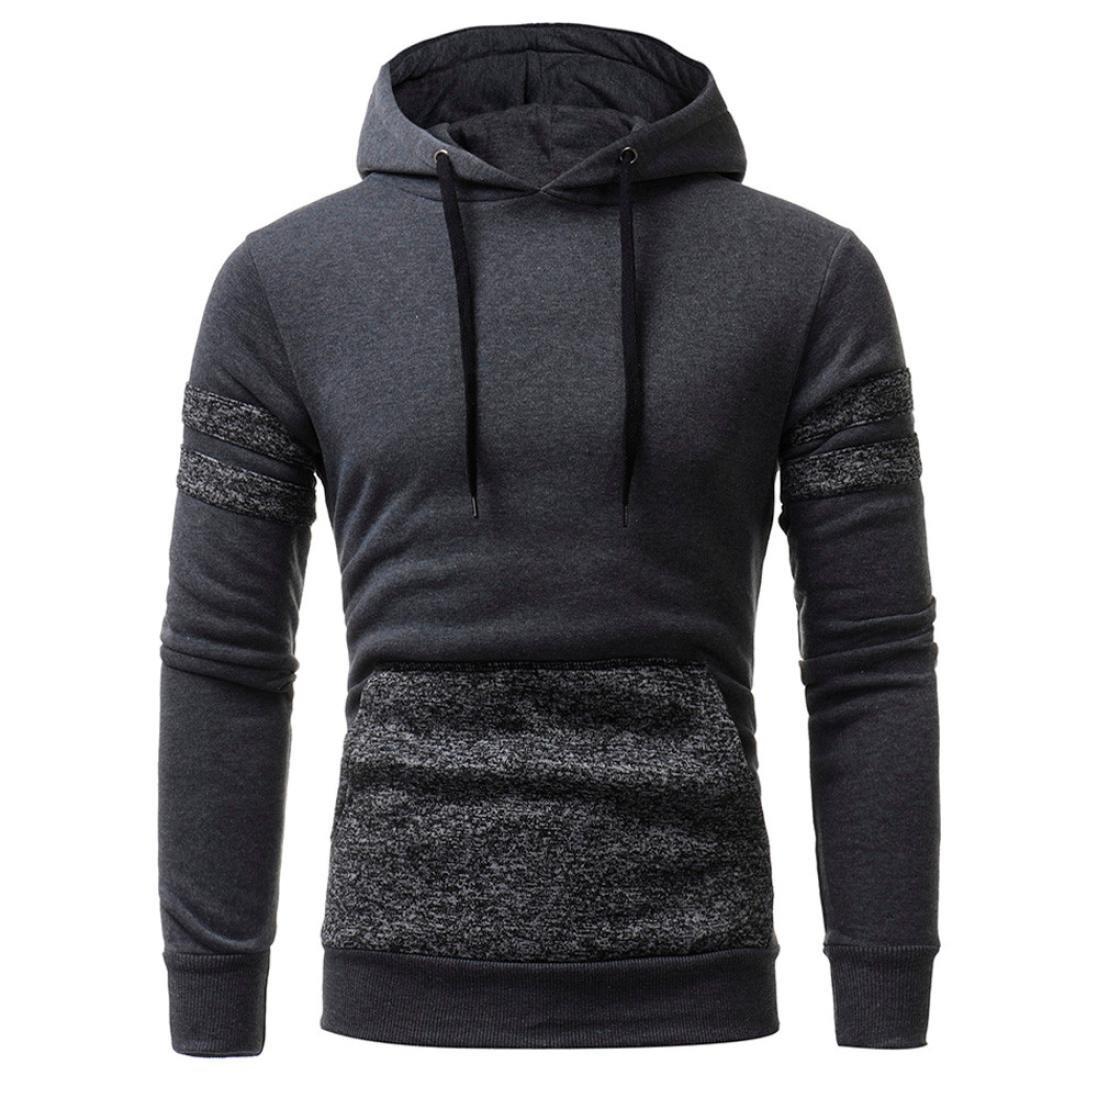 HTHJSCO Hoodie Coats, Men's Sweater Jackets Warm Hooded Sweatshirt Outwear Tops Pullover Jacket with Pocket (Gray, XL) by HTHJSCO